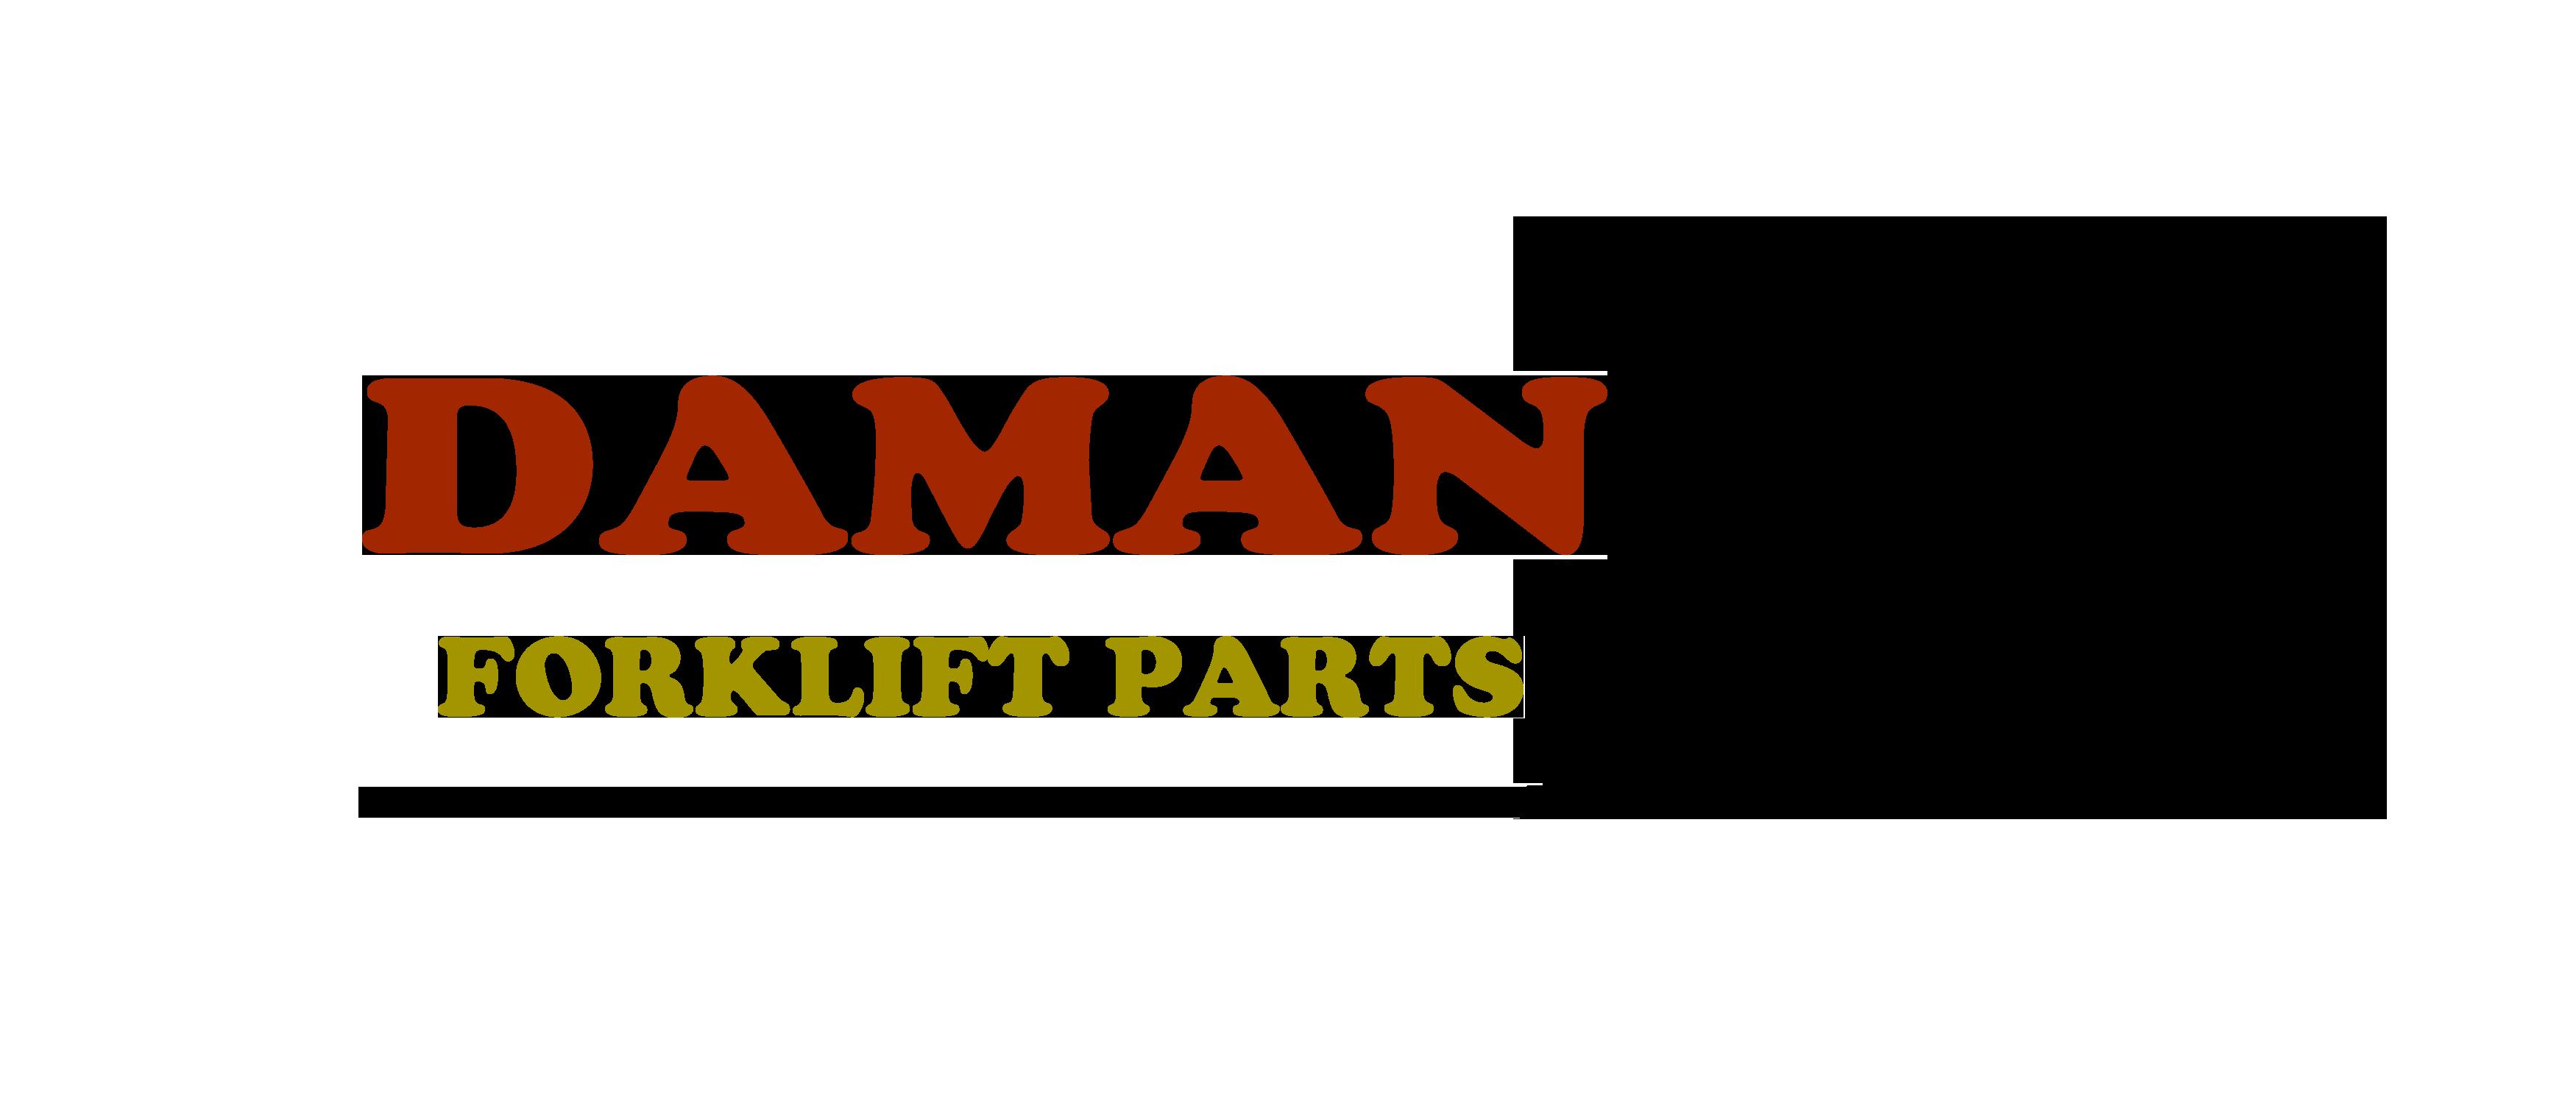 HANGZHOU DAMAN FORKLIFT PARTS CO ,LTD - Forklift parts